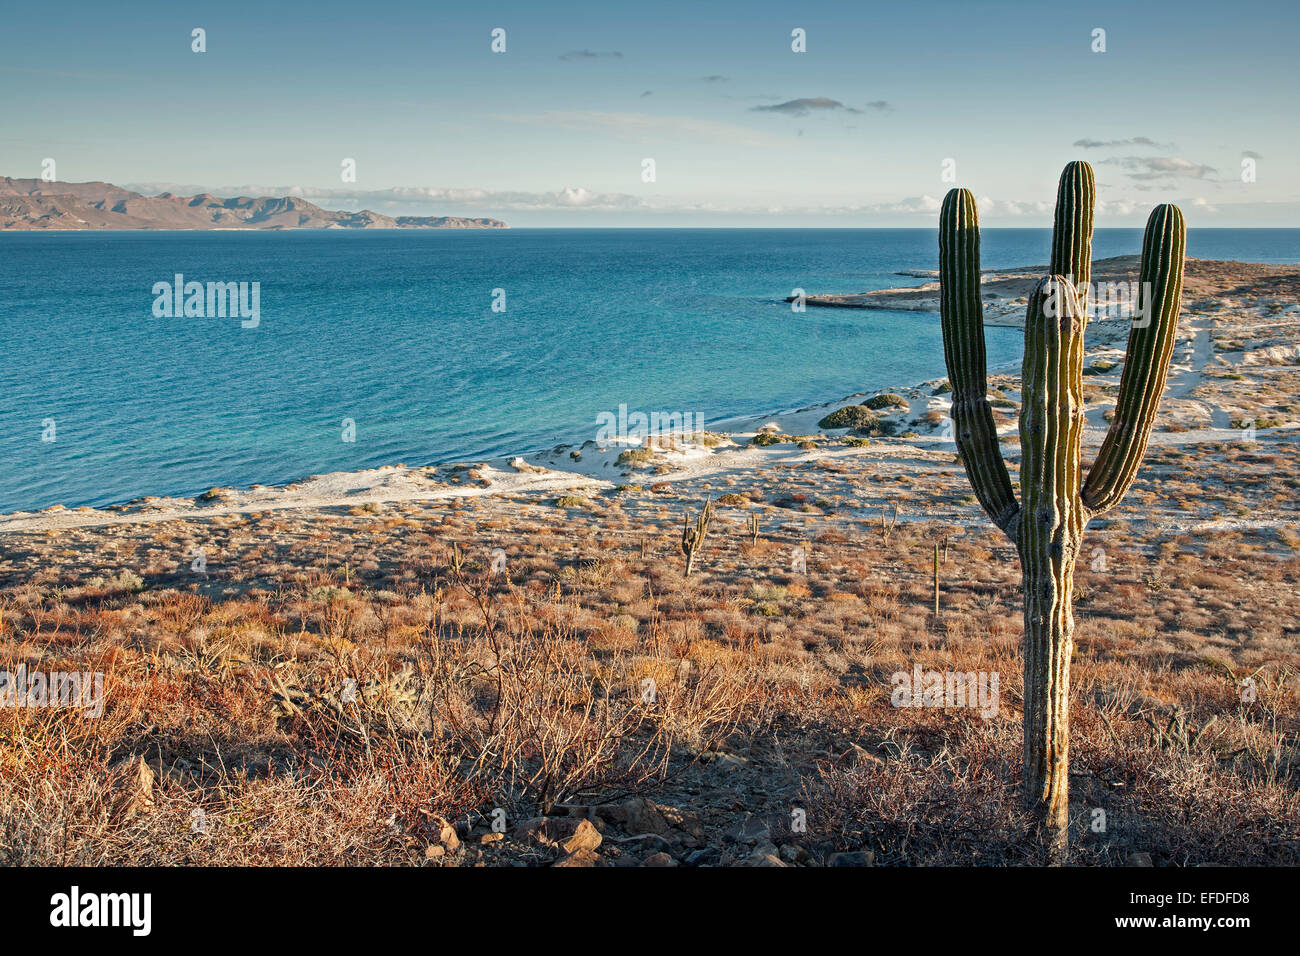 Cactus and sand dunes, near El Tecolote Beach, La Paz, Baja California Sur, Mexico - Stock Image